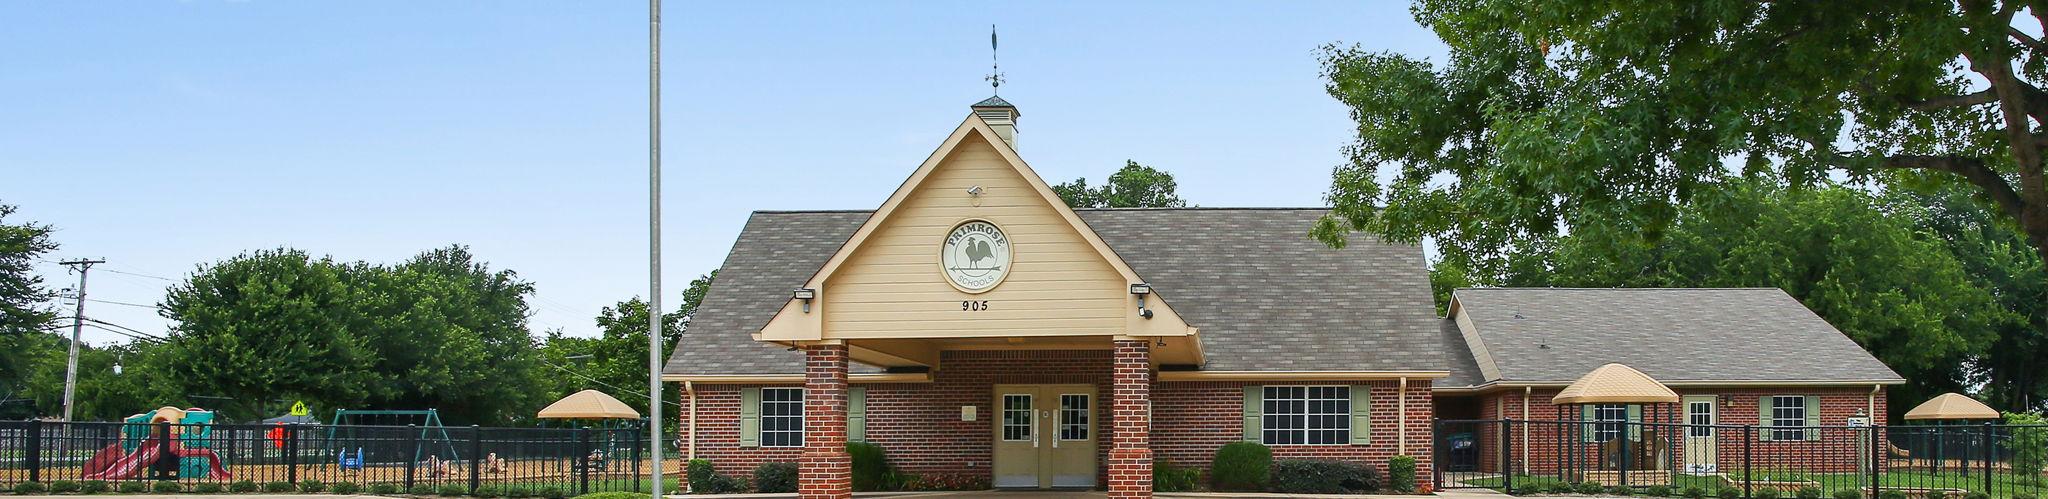 Exterior of a Primrose School of Keller